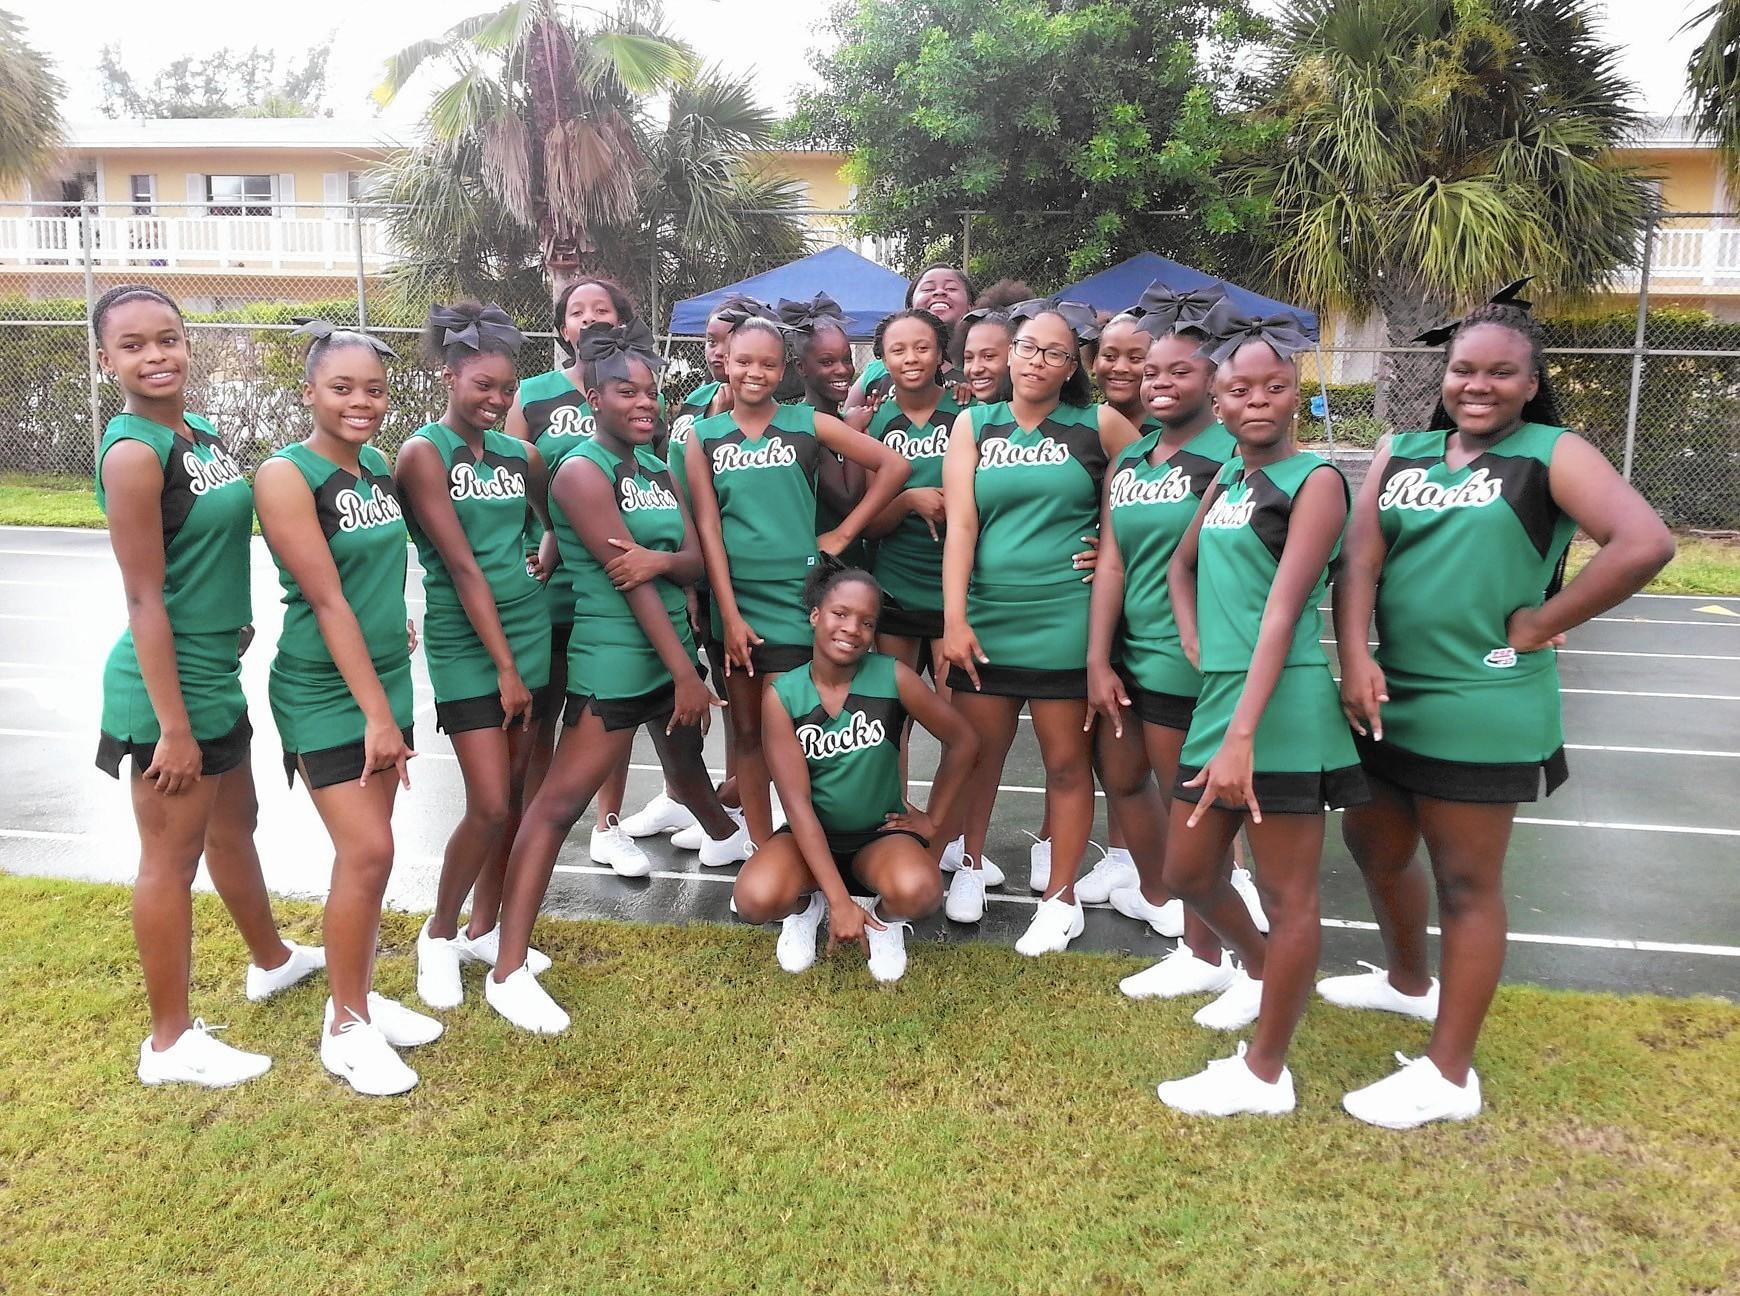 cheerleading and football season start the fall sports season in